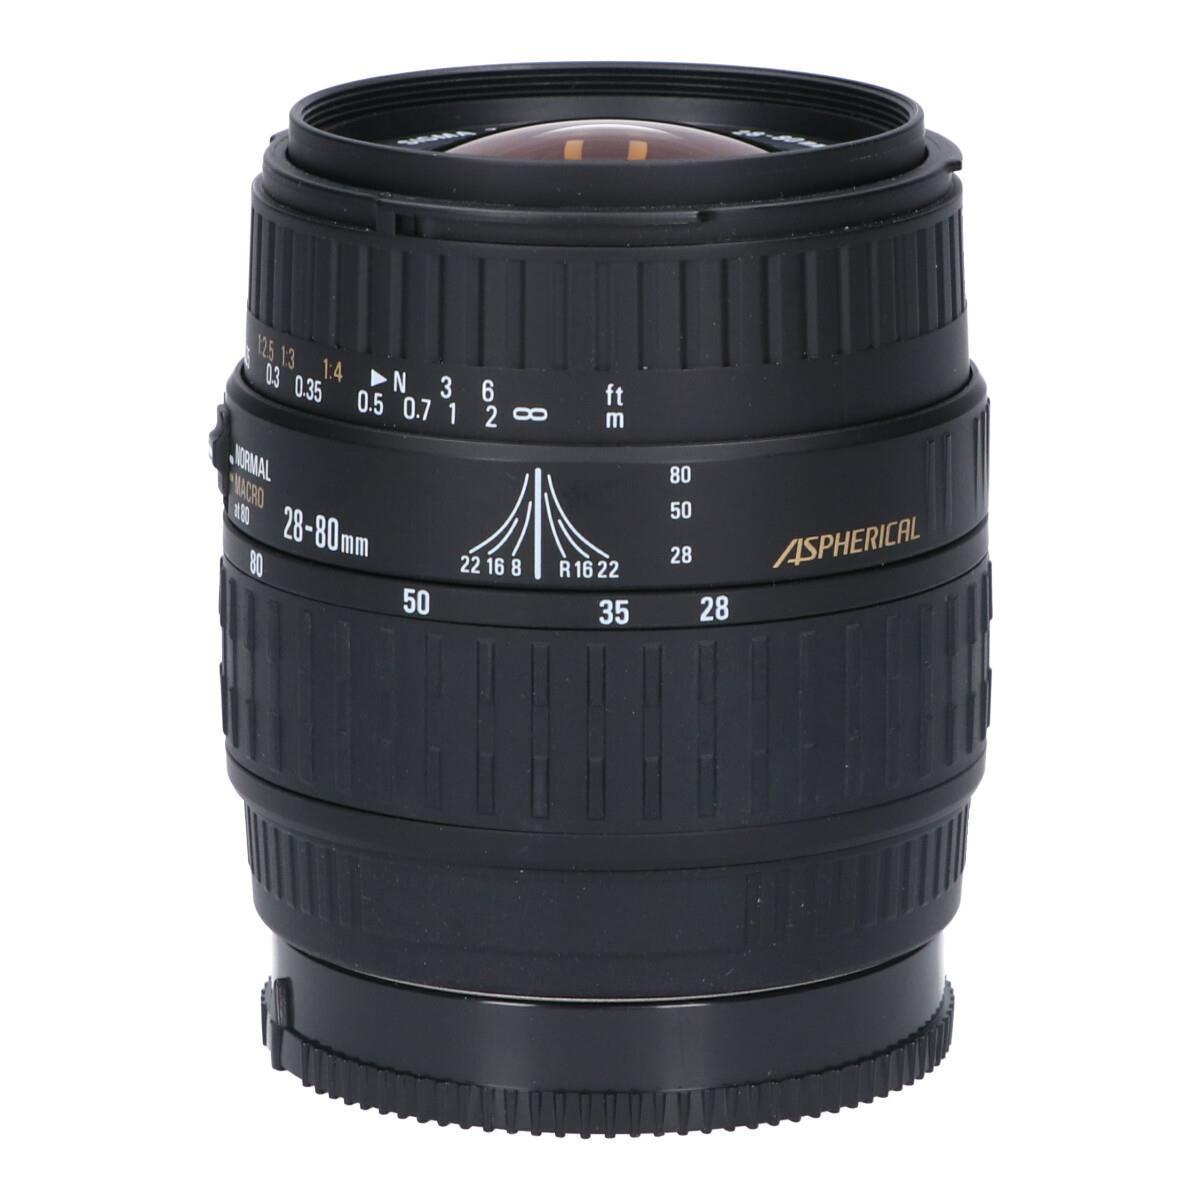 SIGMA α28-80mm F3.5-5.6? MACRO